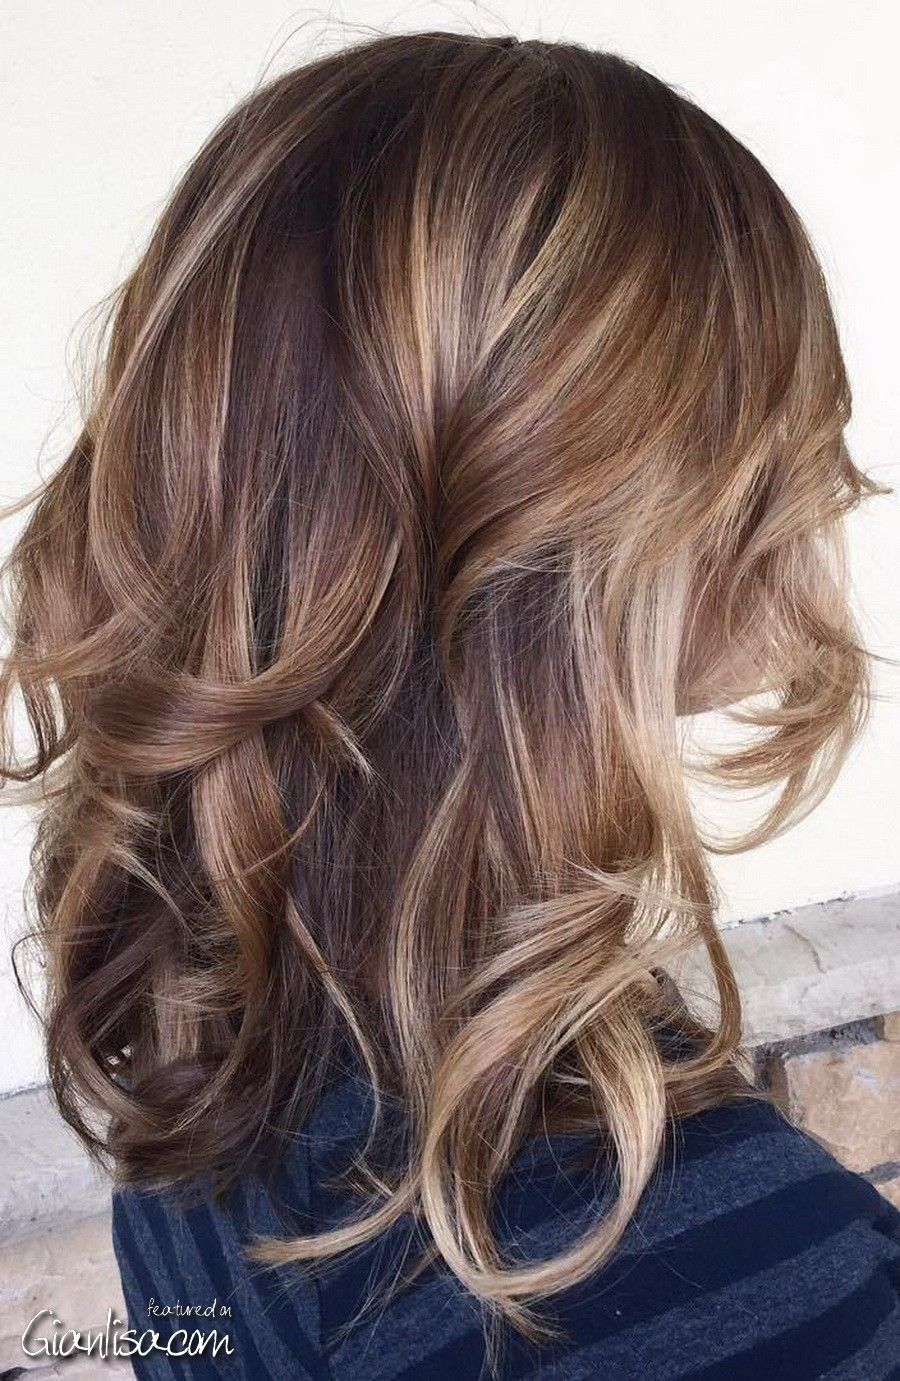 Brown Caramel Balayage Blonde Mixed Hair Color Ideas